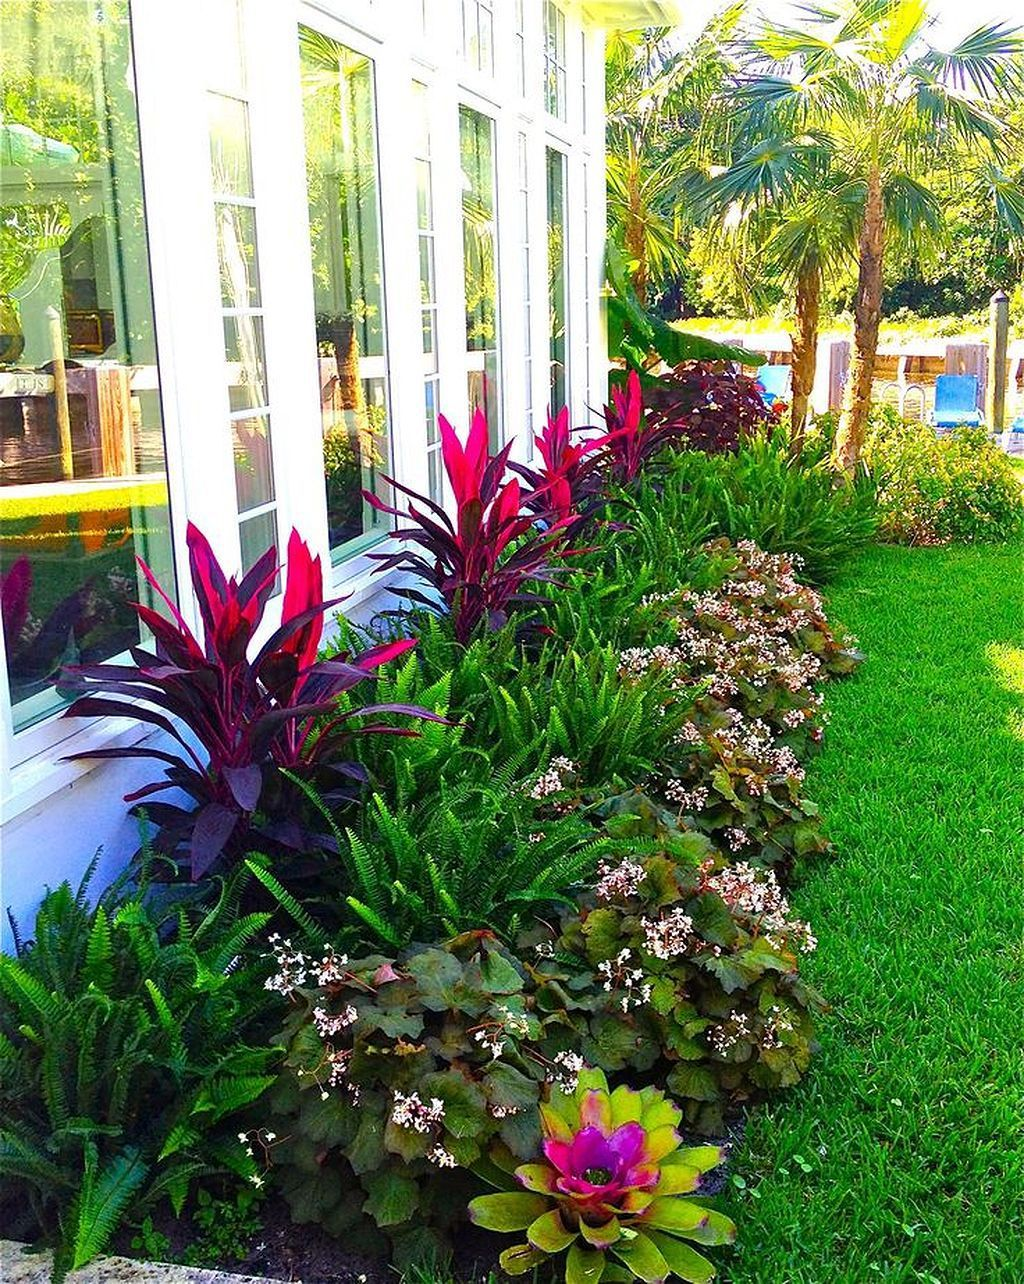 The Ultimate Revelation Of Tropical Landscaping 81 - The Ultimate Revelation Of Tropical Landscaping 81 Acreage